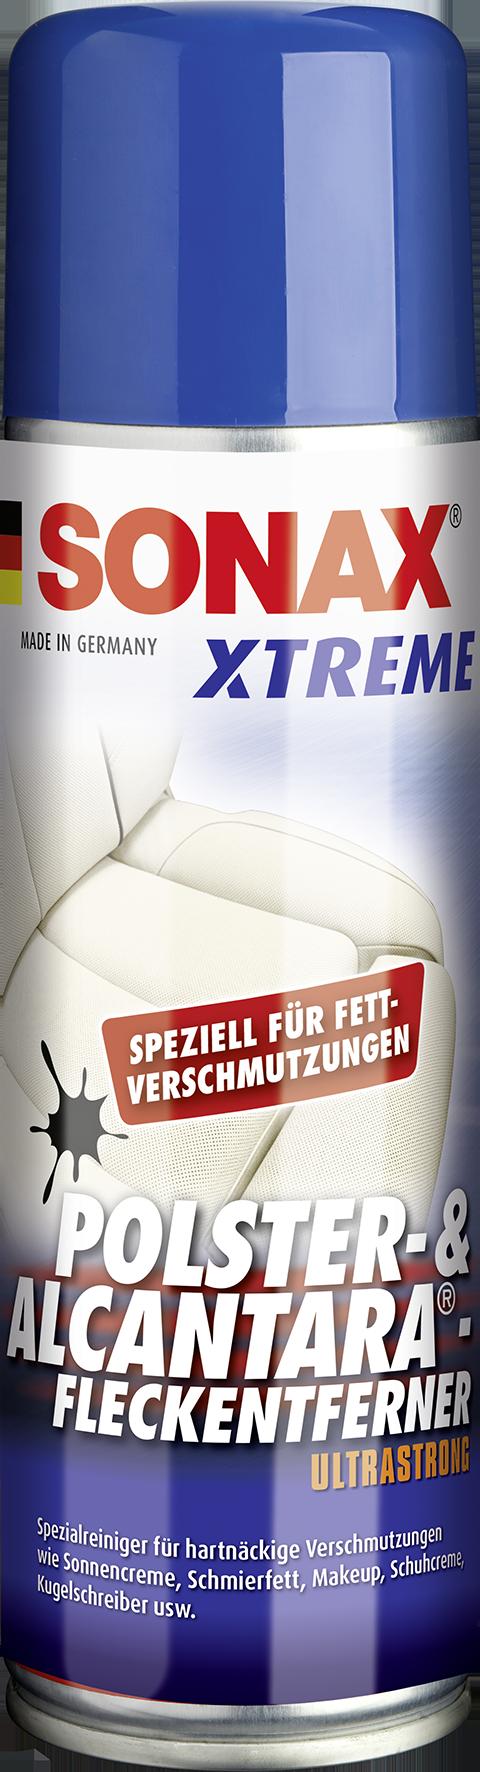 SONAX 02522000  XTREME Polster+AlcantaraFleckEntferner 300 ml